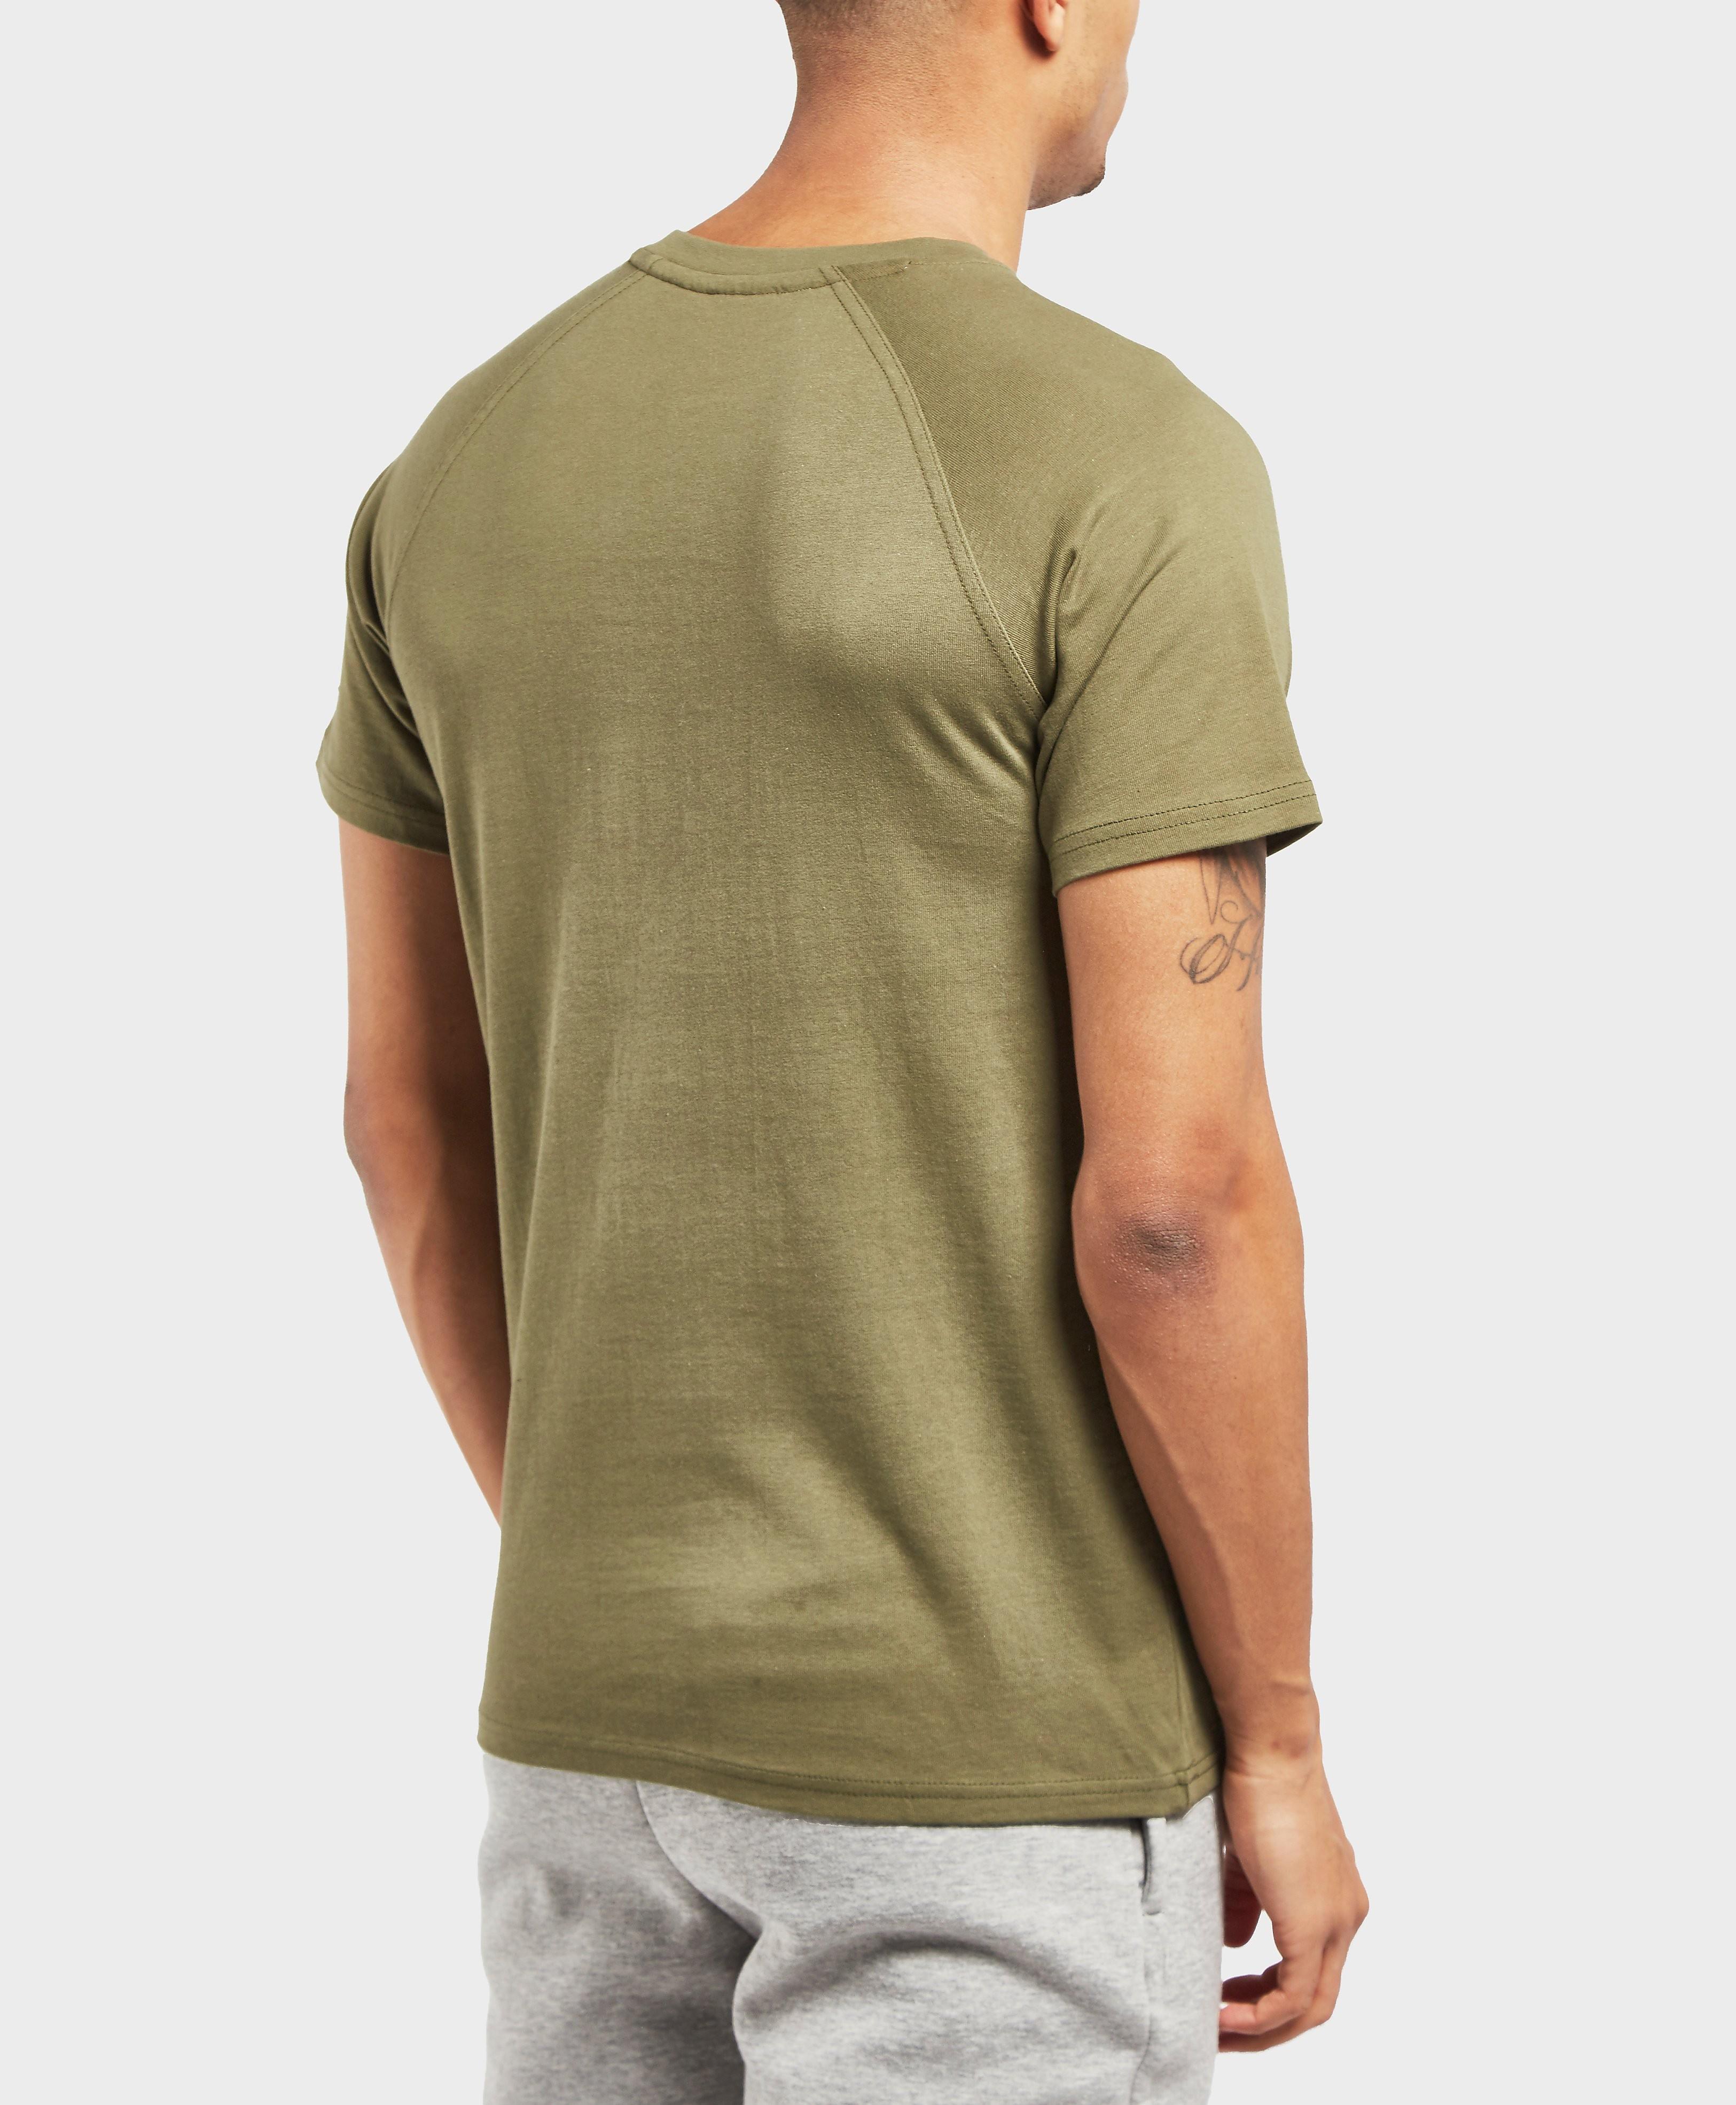 Fila Overhaul Short Sleeve T-Shirt